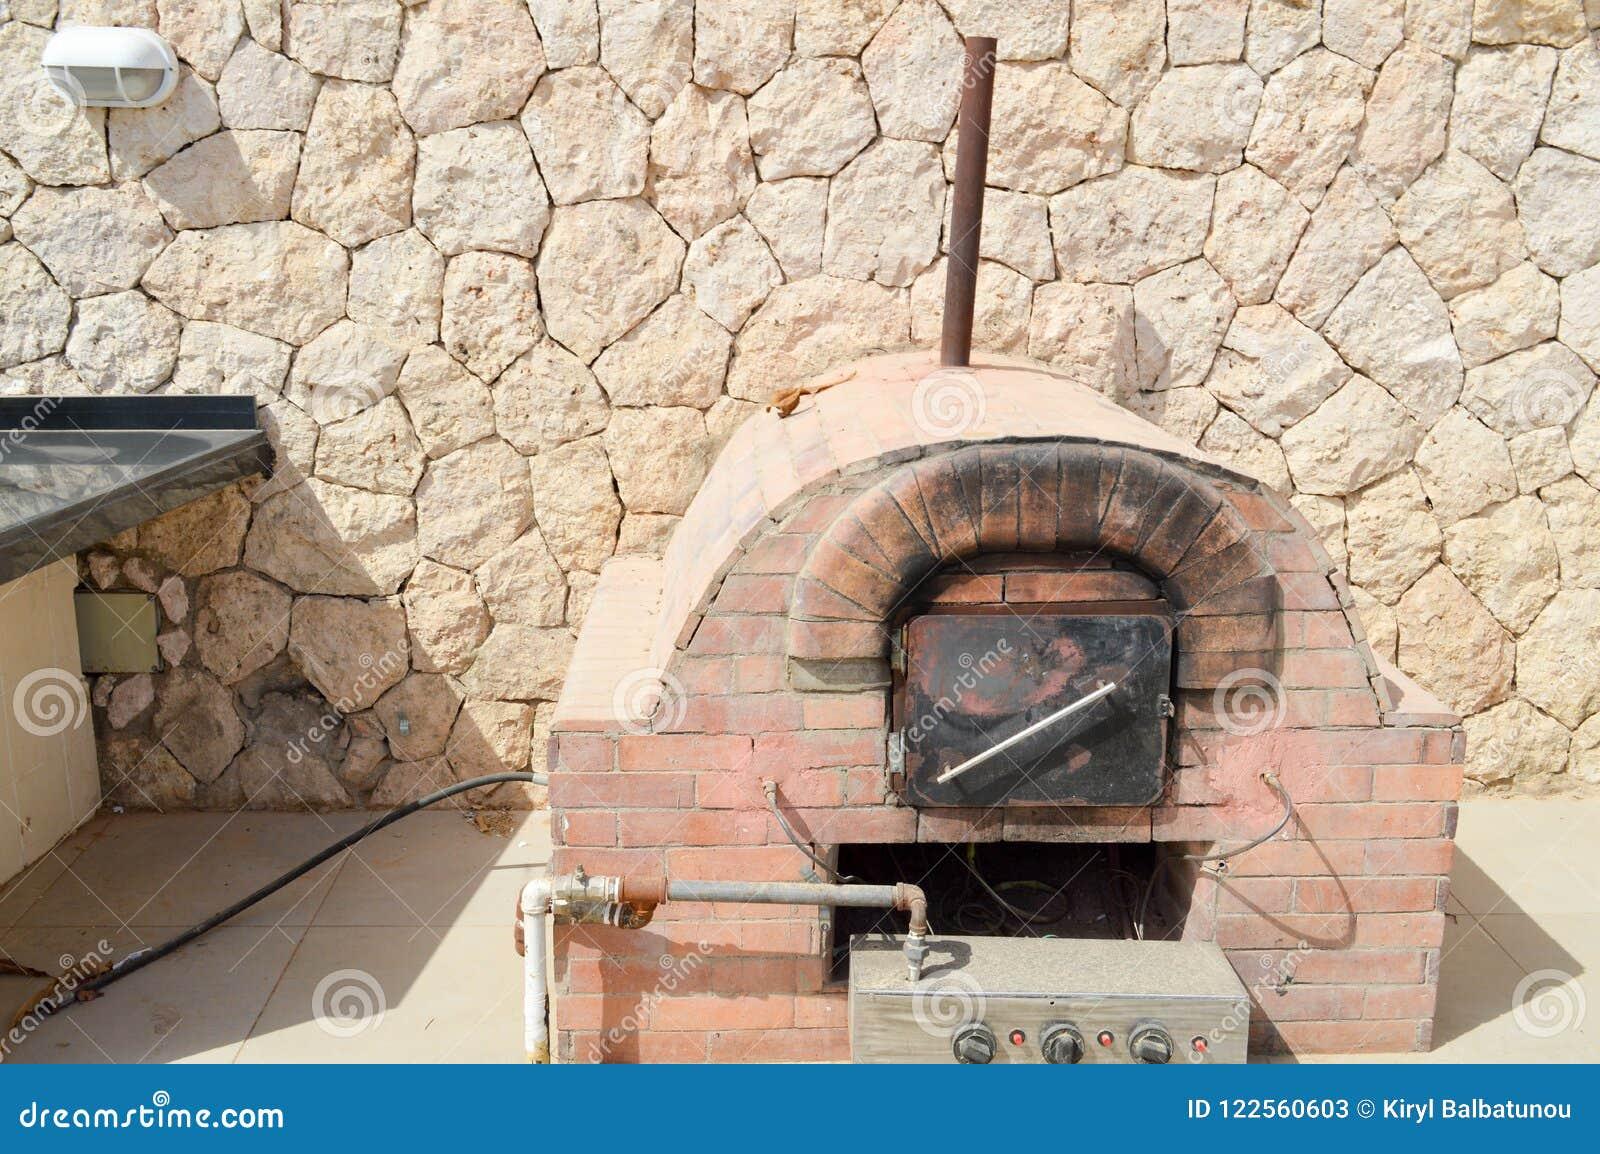 old stone oven baking stone instructions